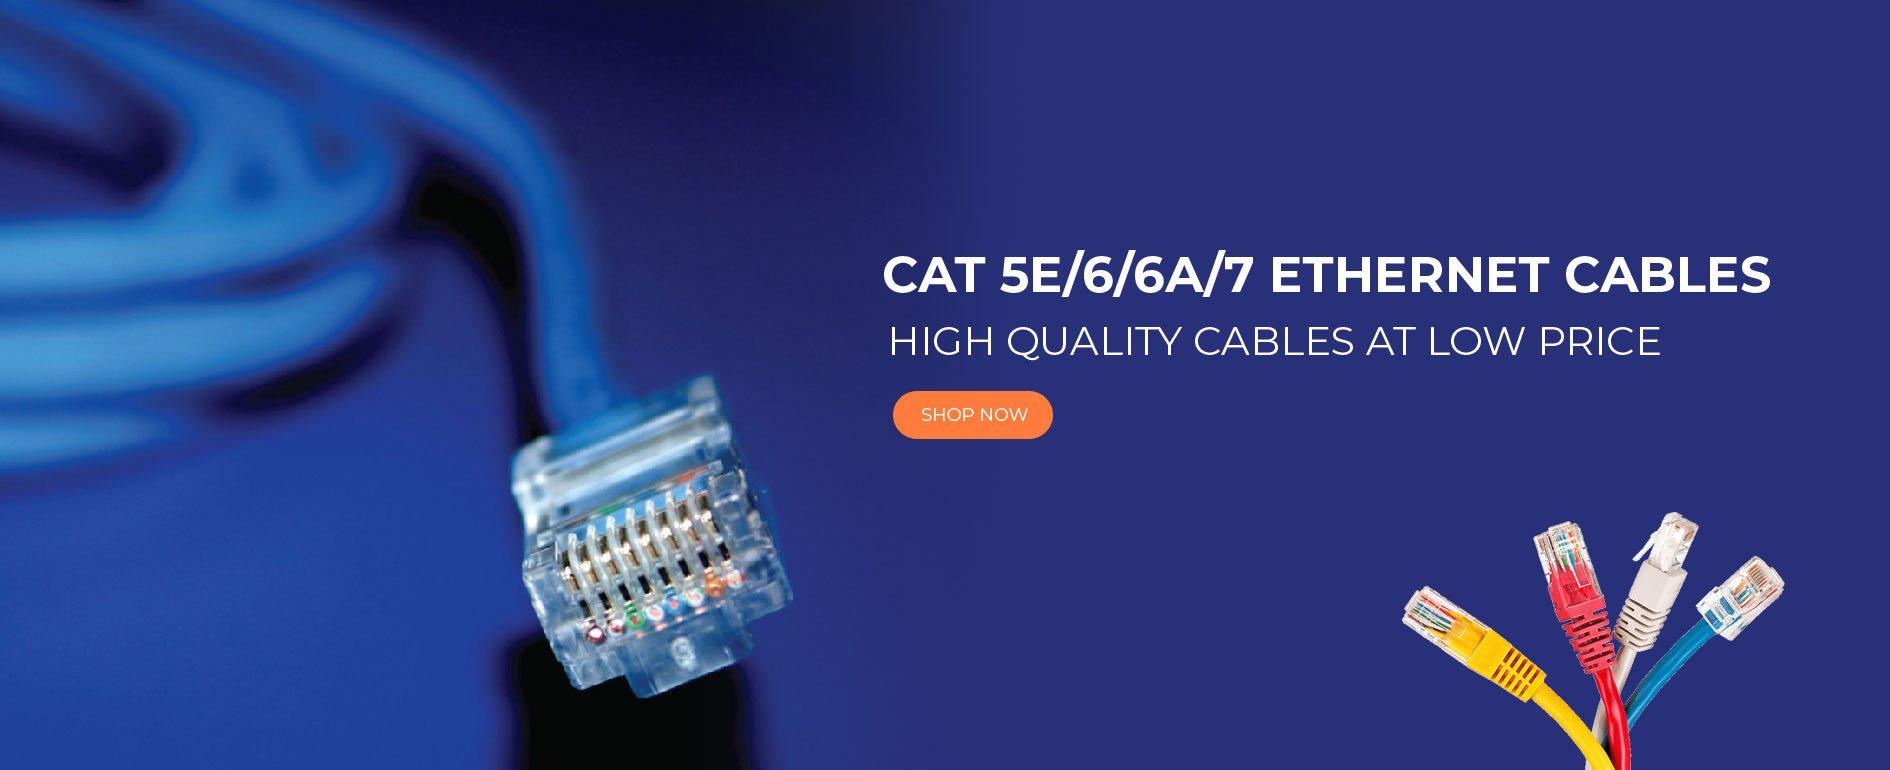 1597756281Ethernet-cable-shop-in-kenya-best-ethernet-cable-prices-in-kenya.jpg